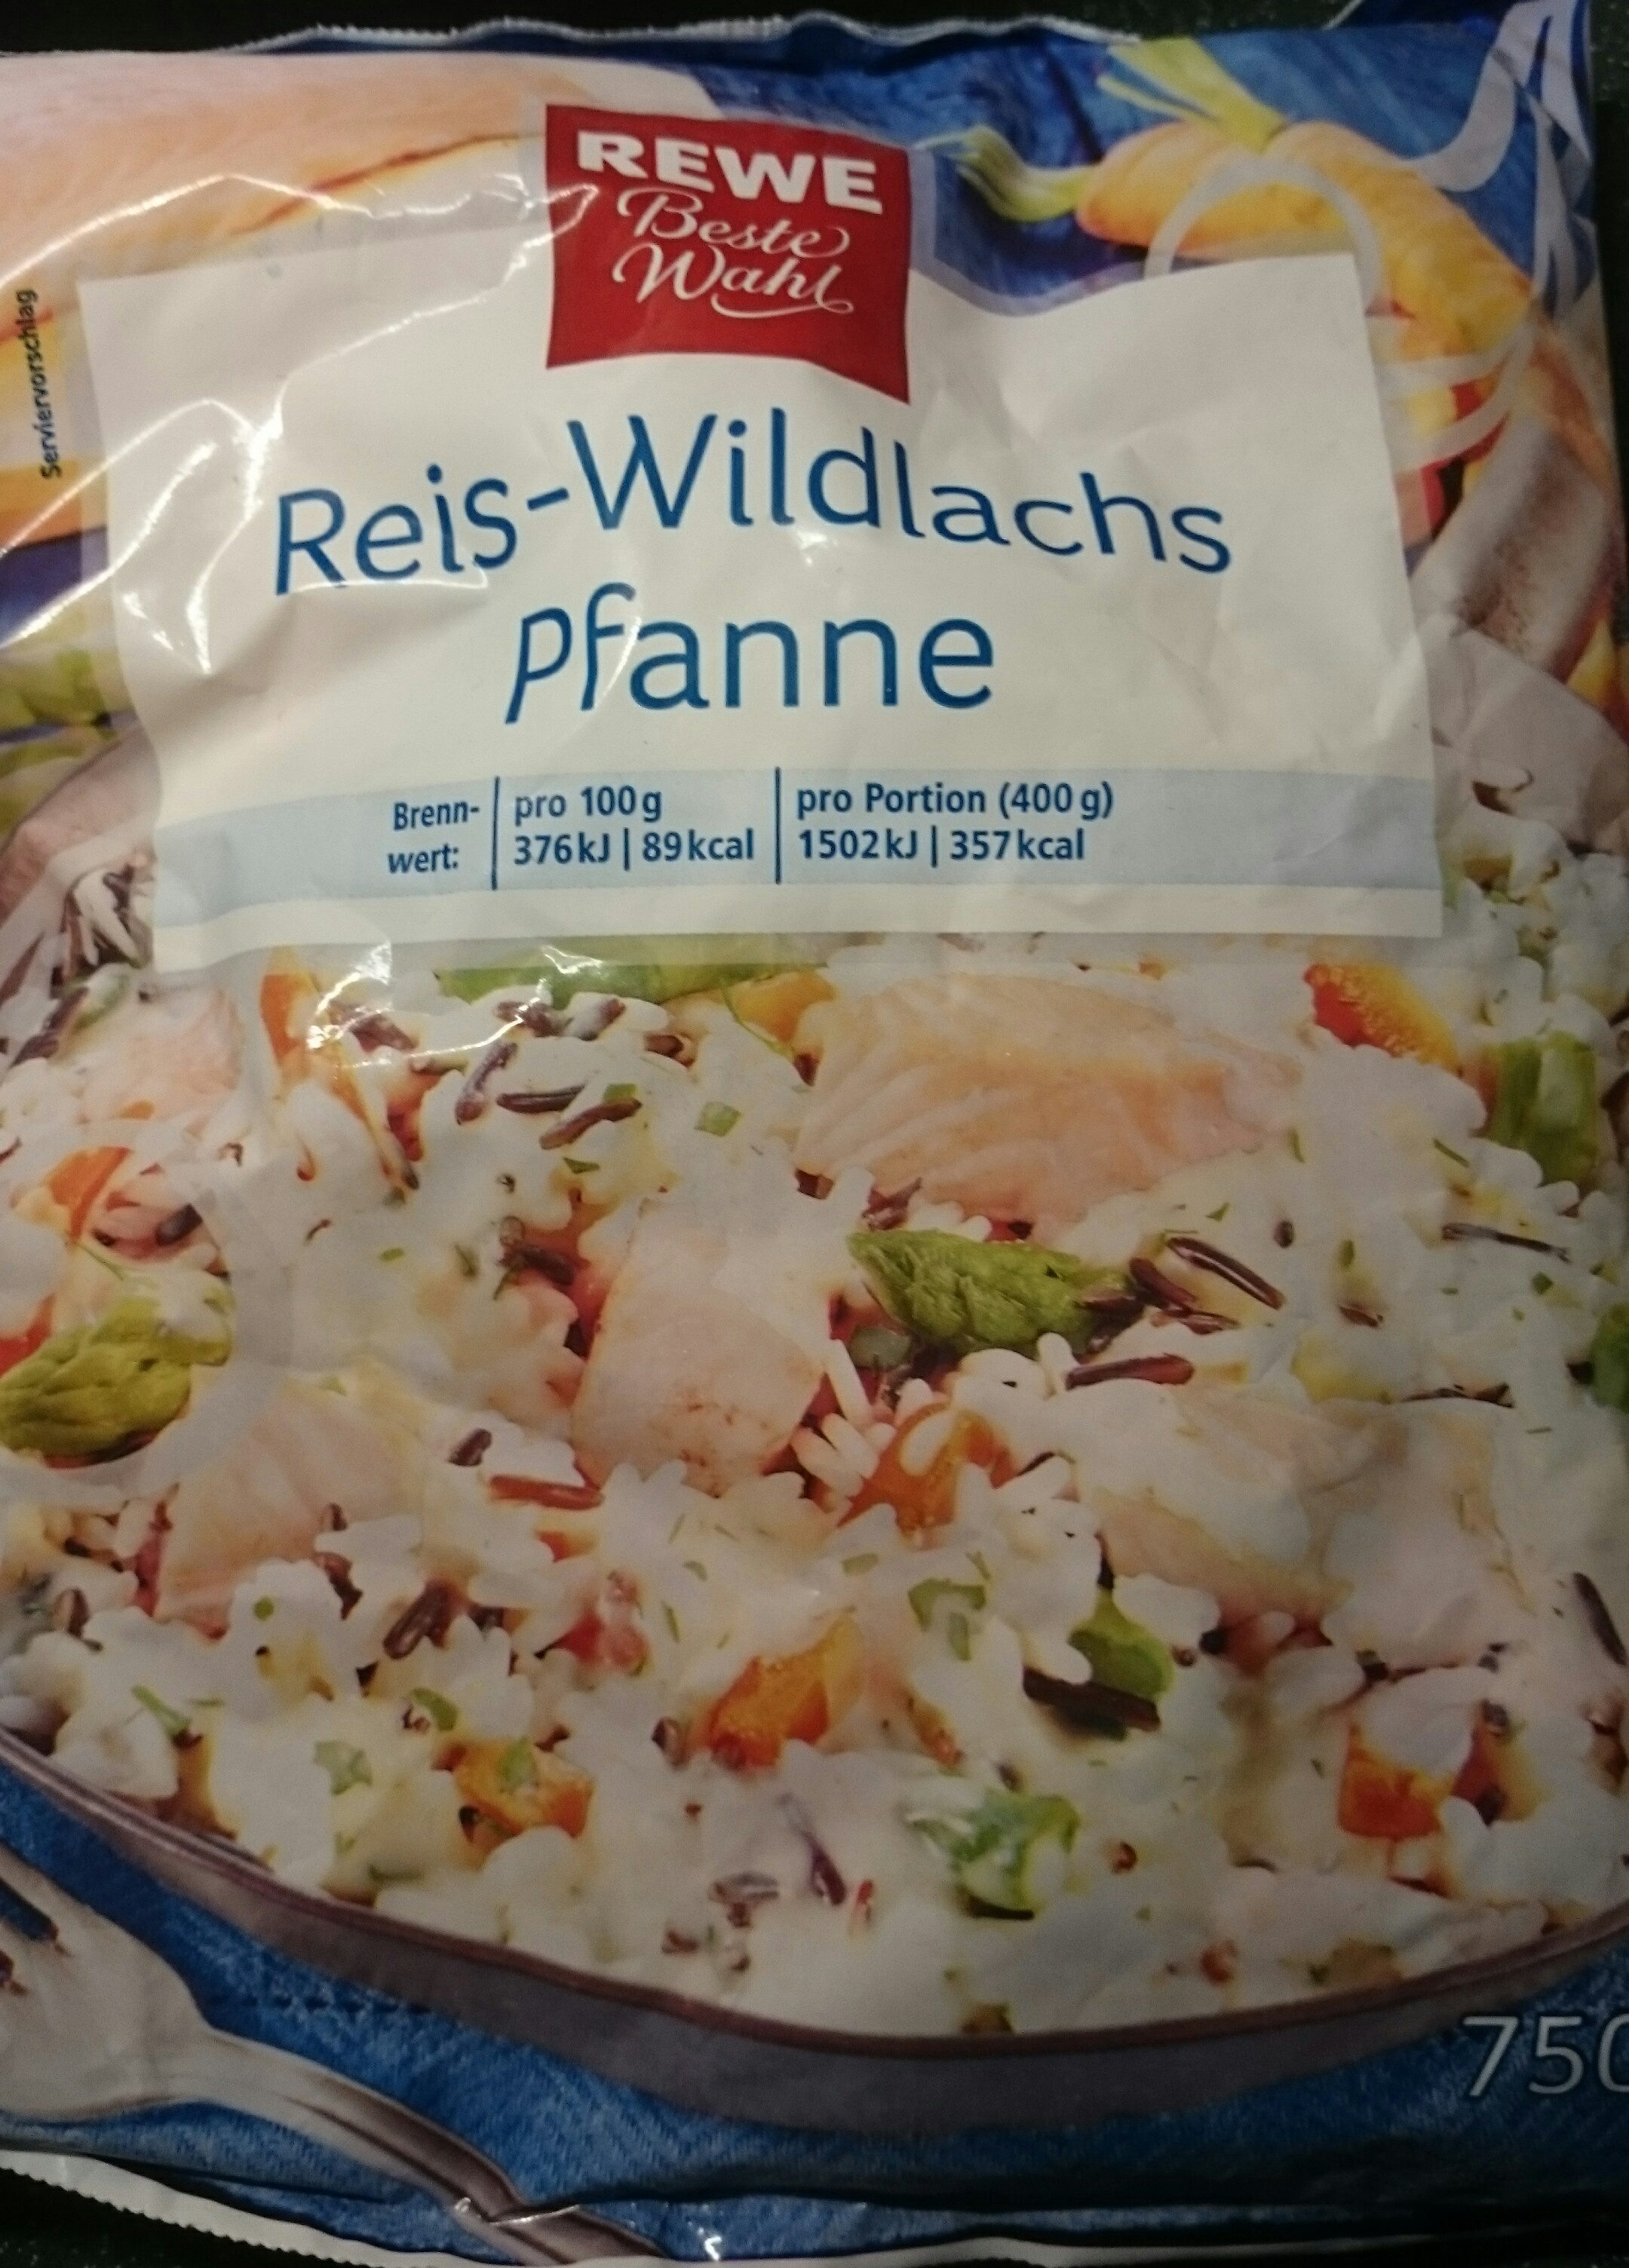 Reis-Wildlachs-Pfanne - Produit - de